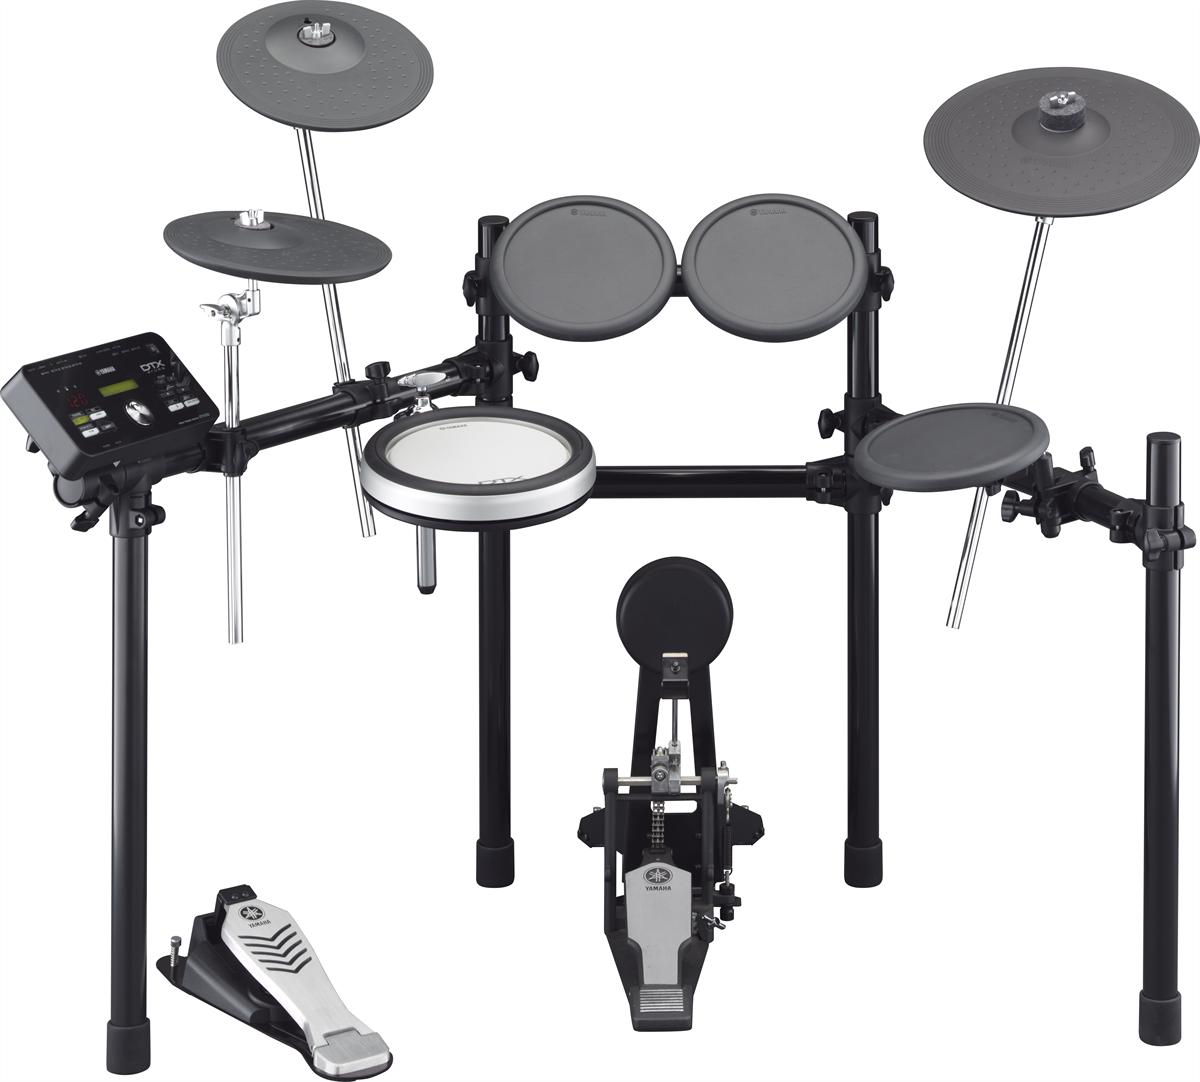 DTX522K Yamaha Complete E-Drum Set